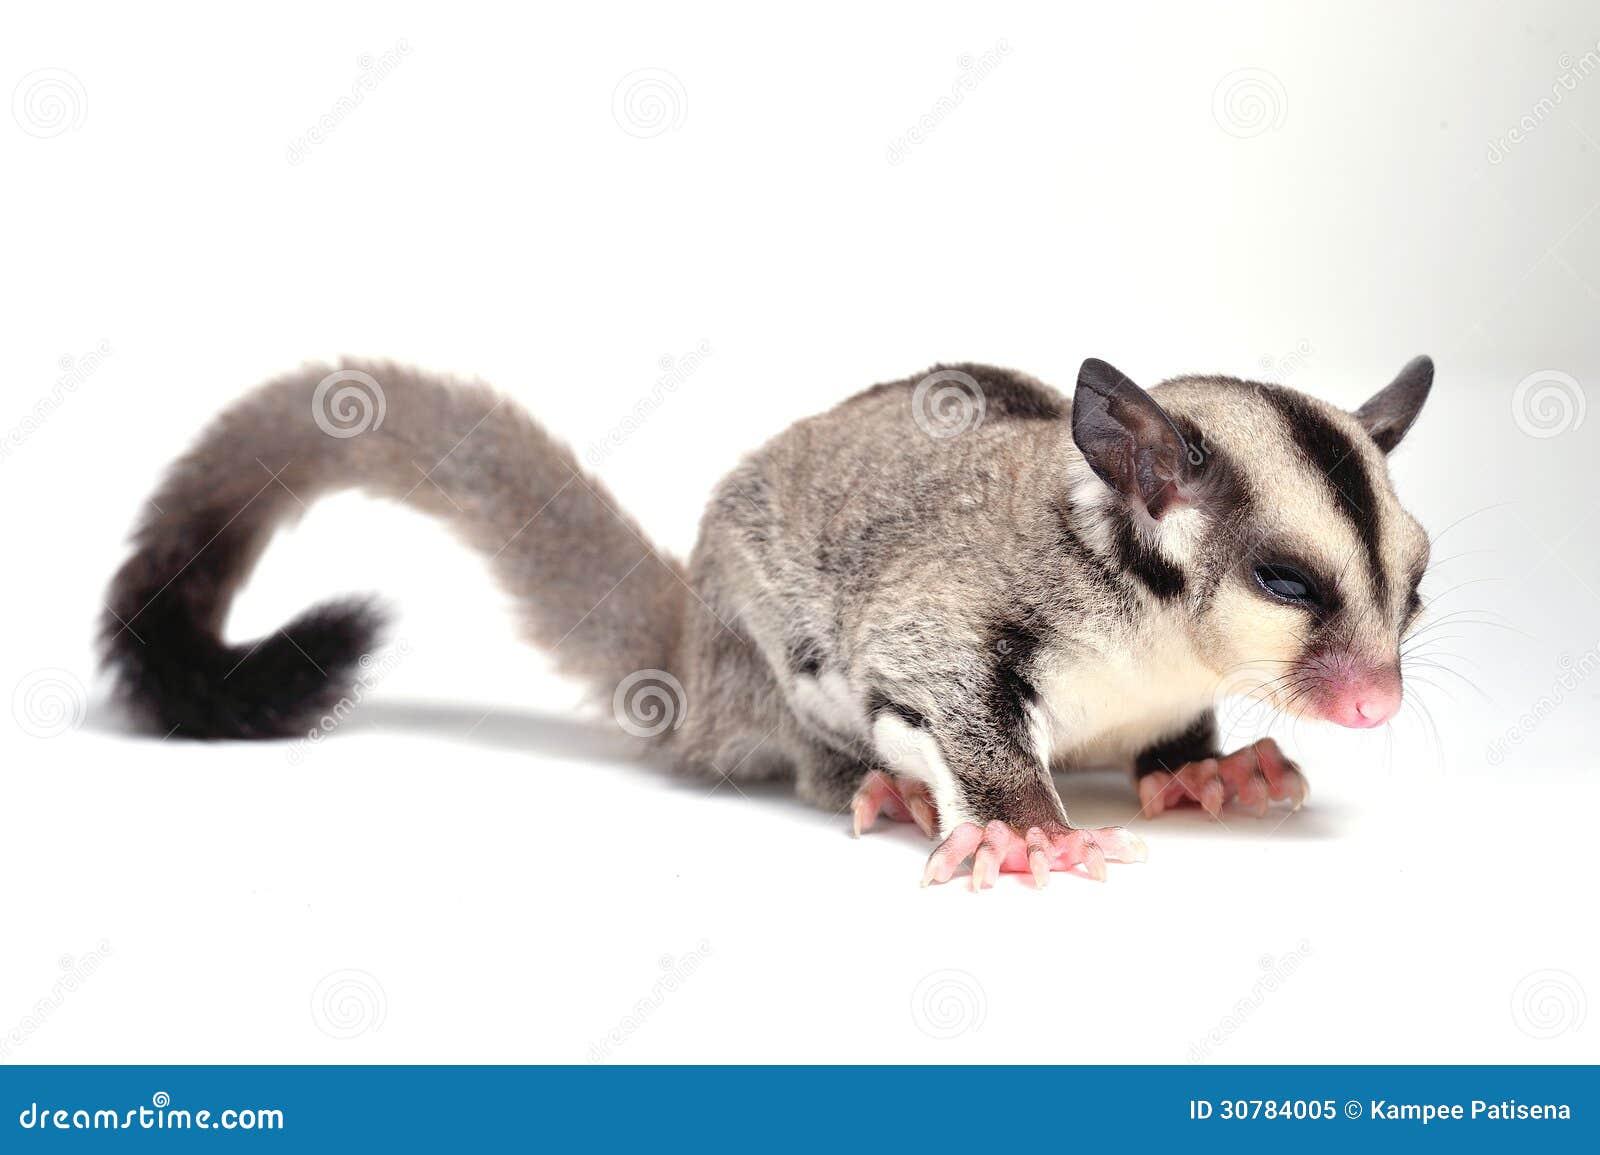 Hedgehog Preservation Society